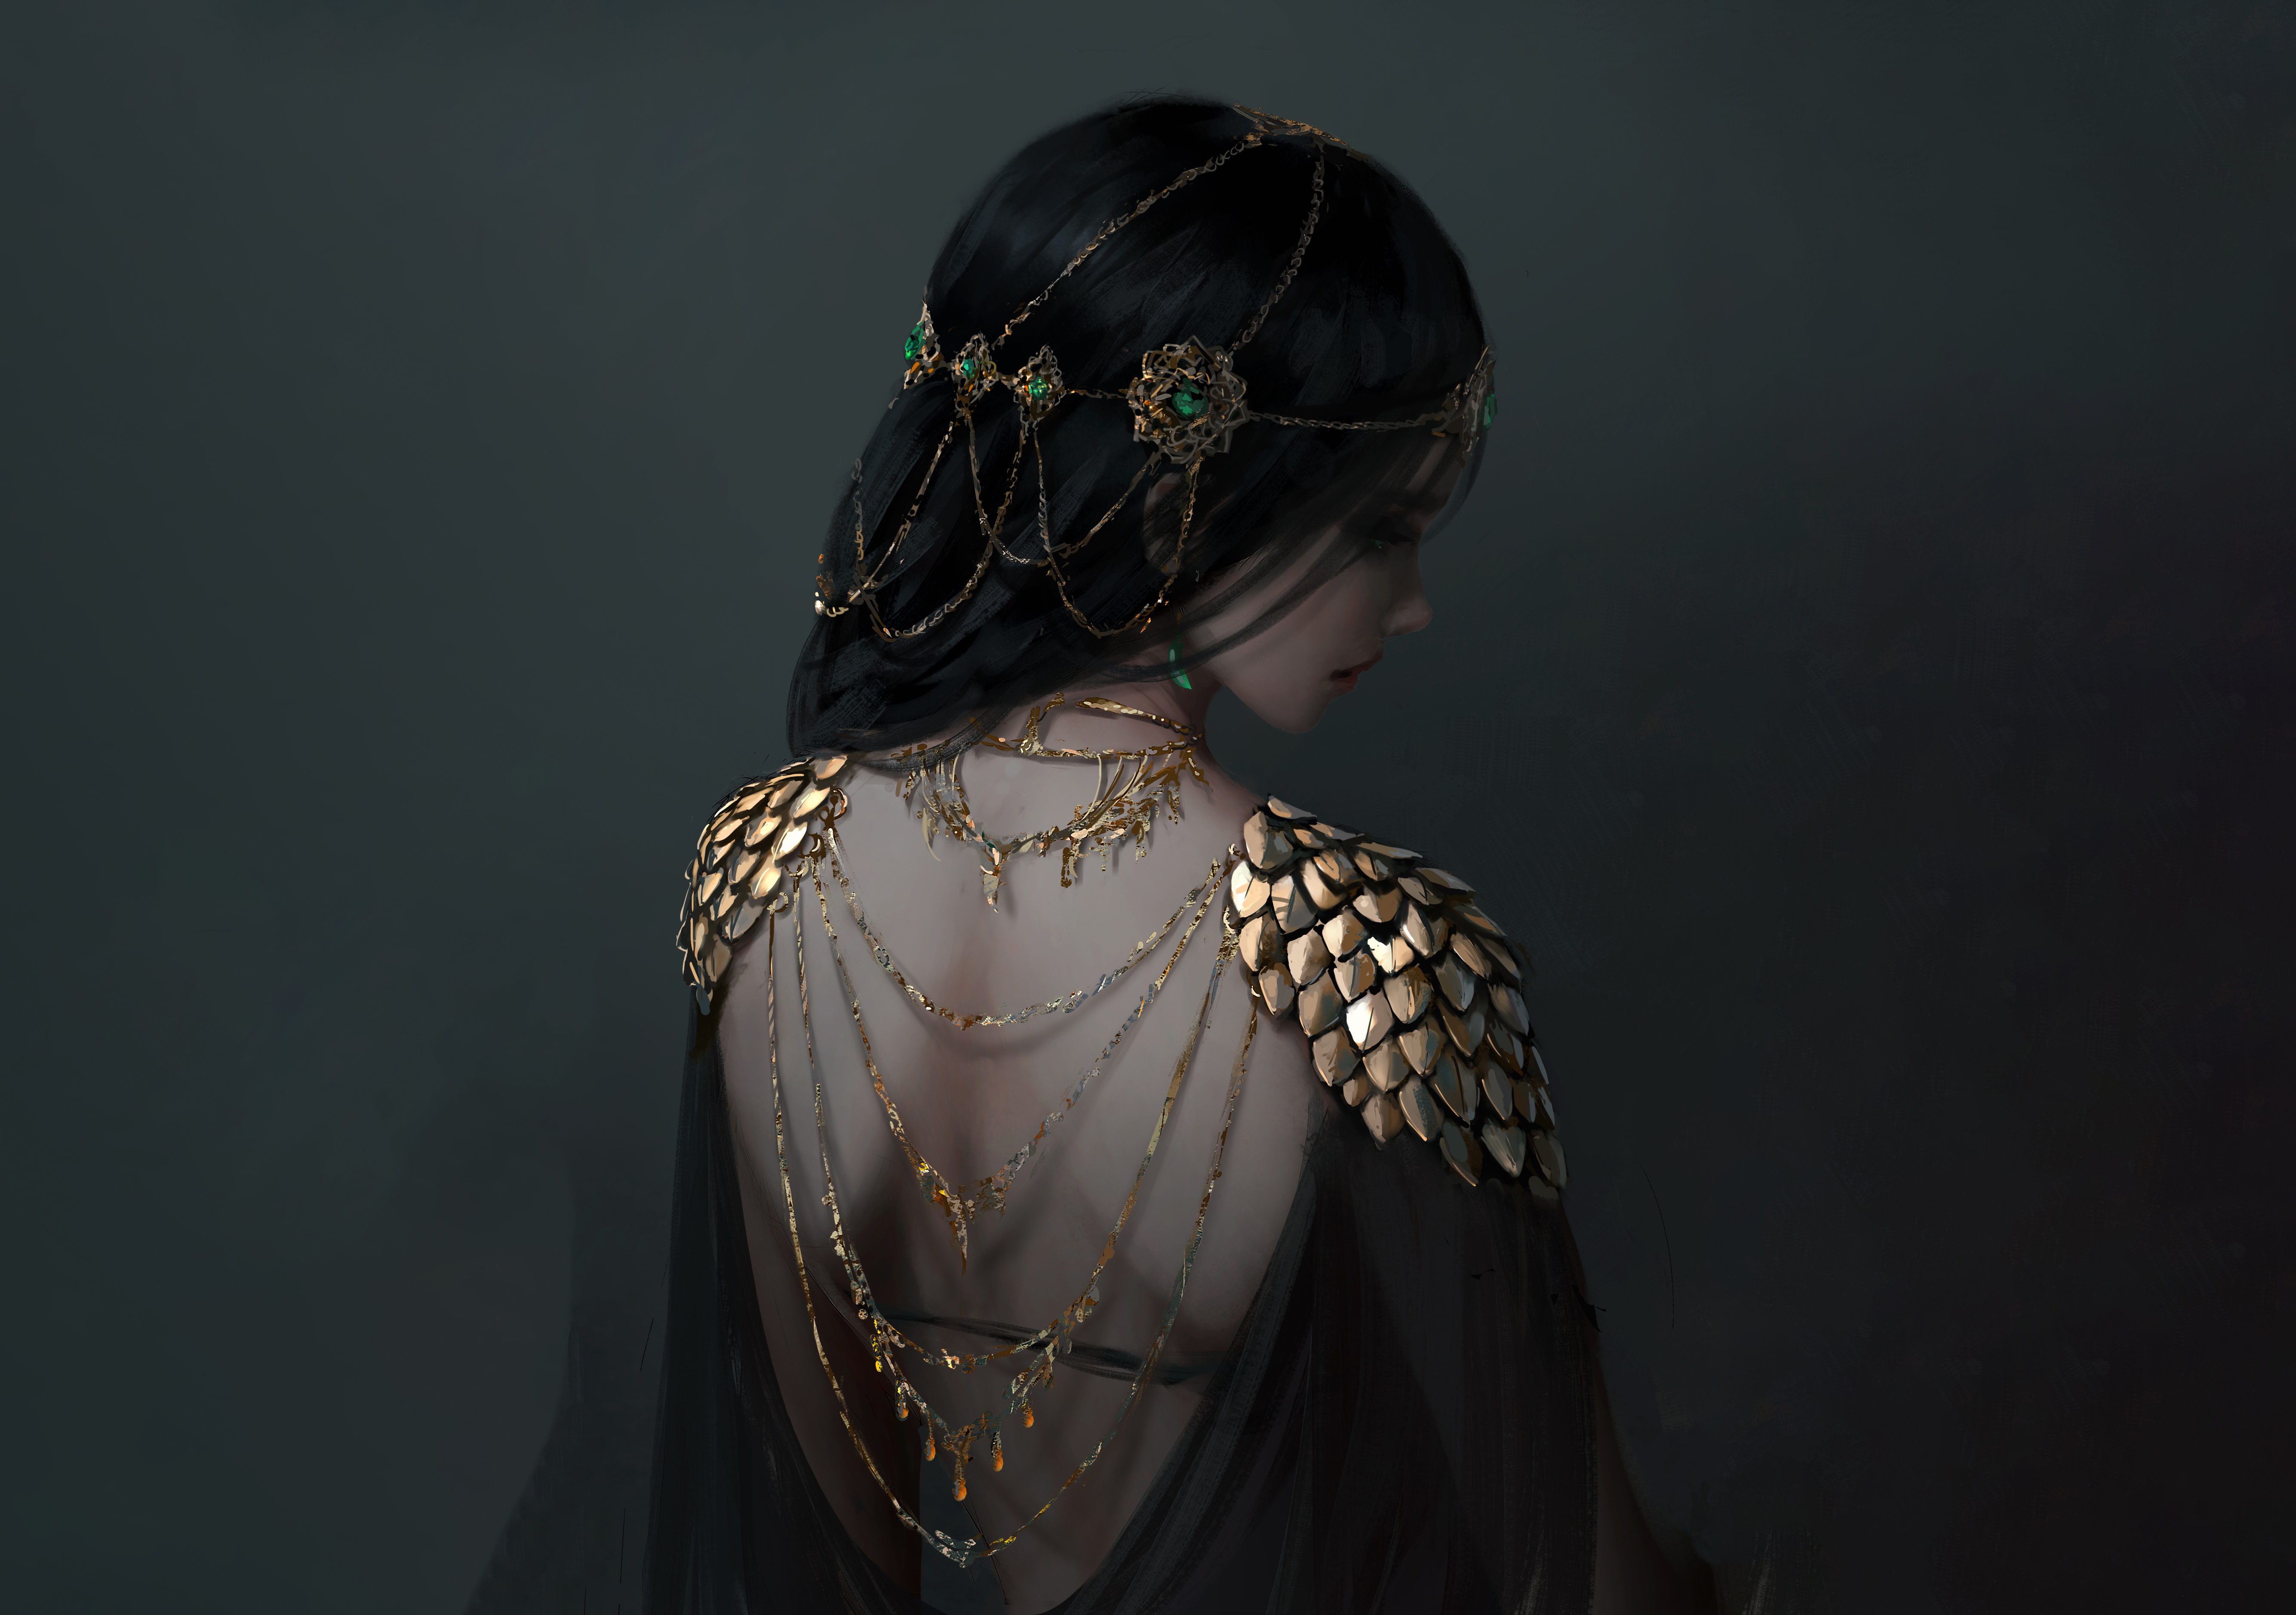 Anime 5339x3755 women black hair WLOP fantasy art fantasy girl